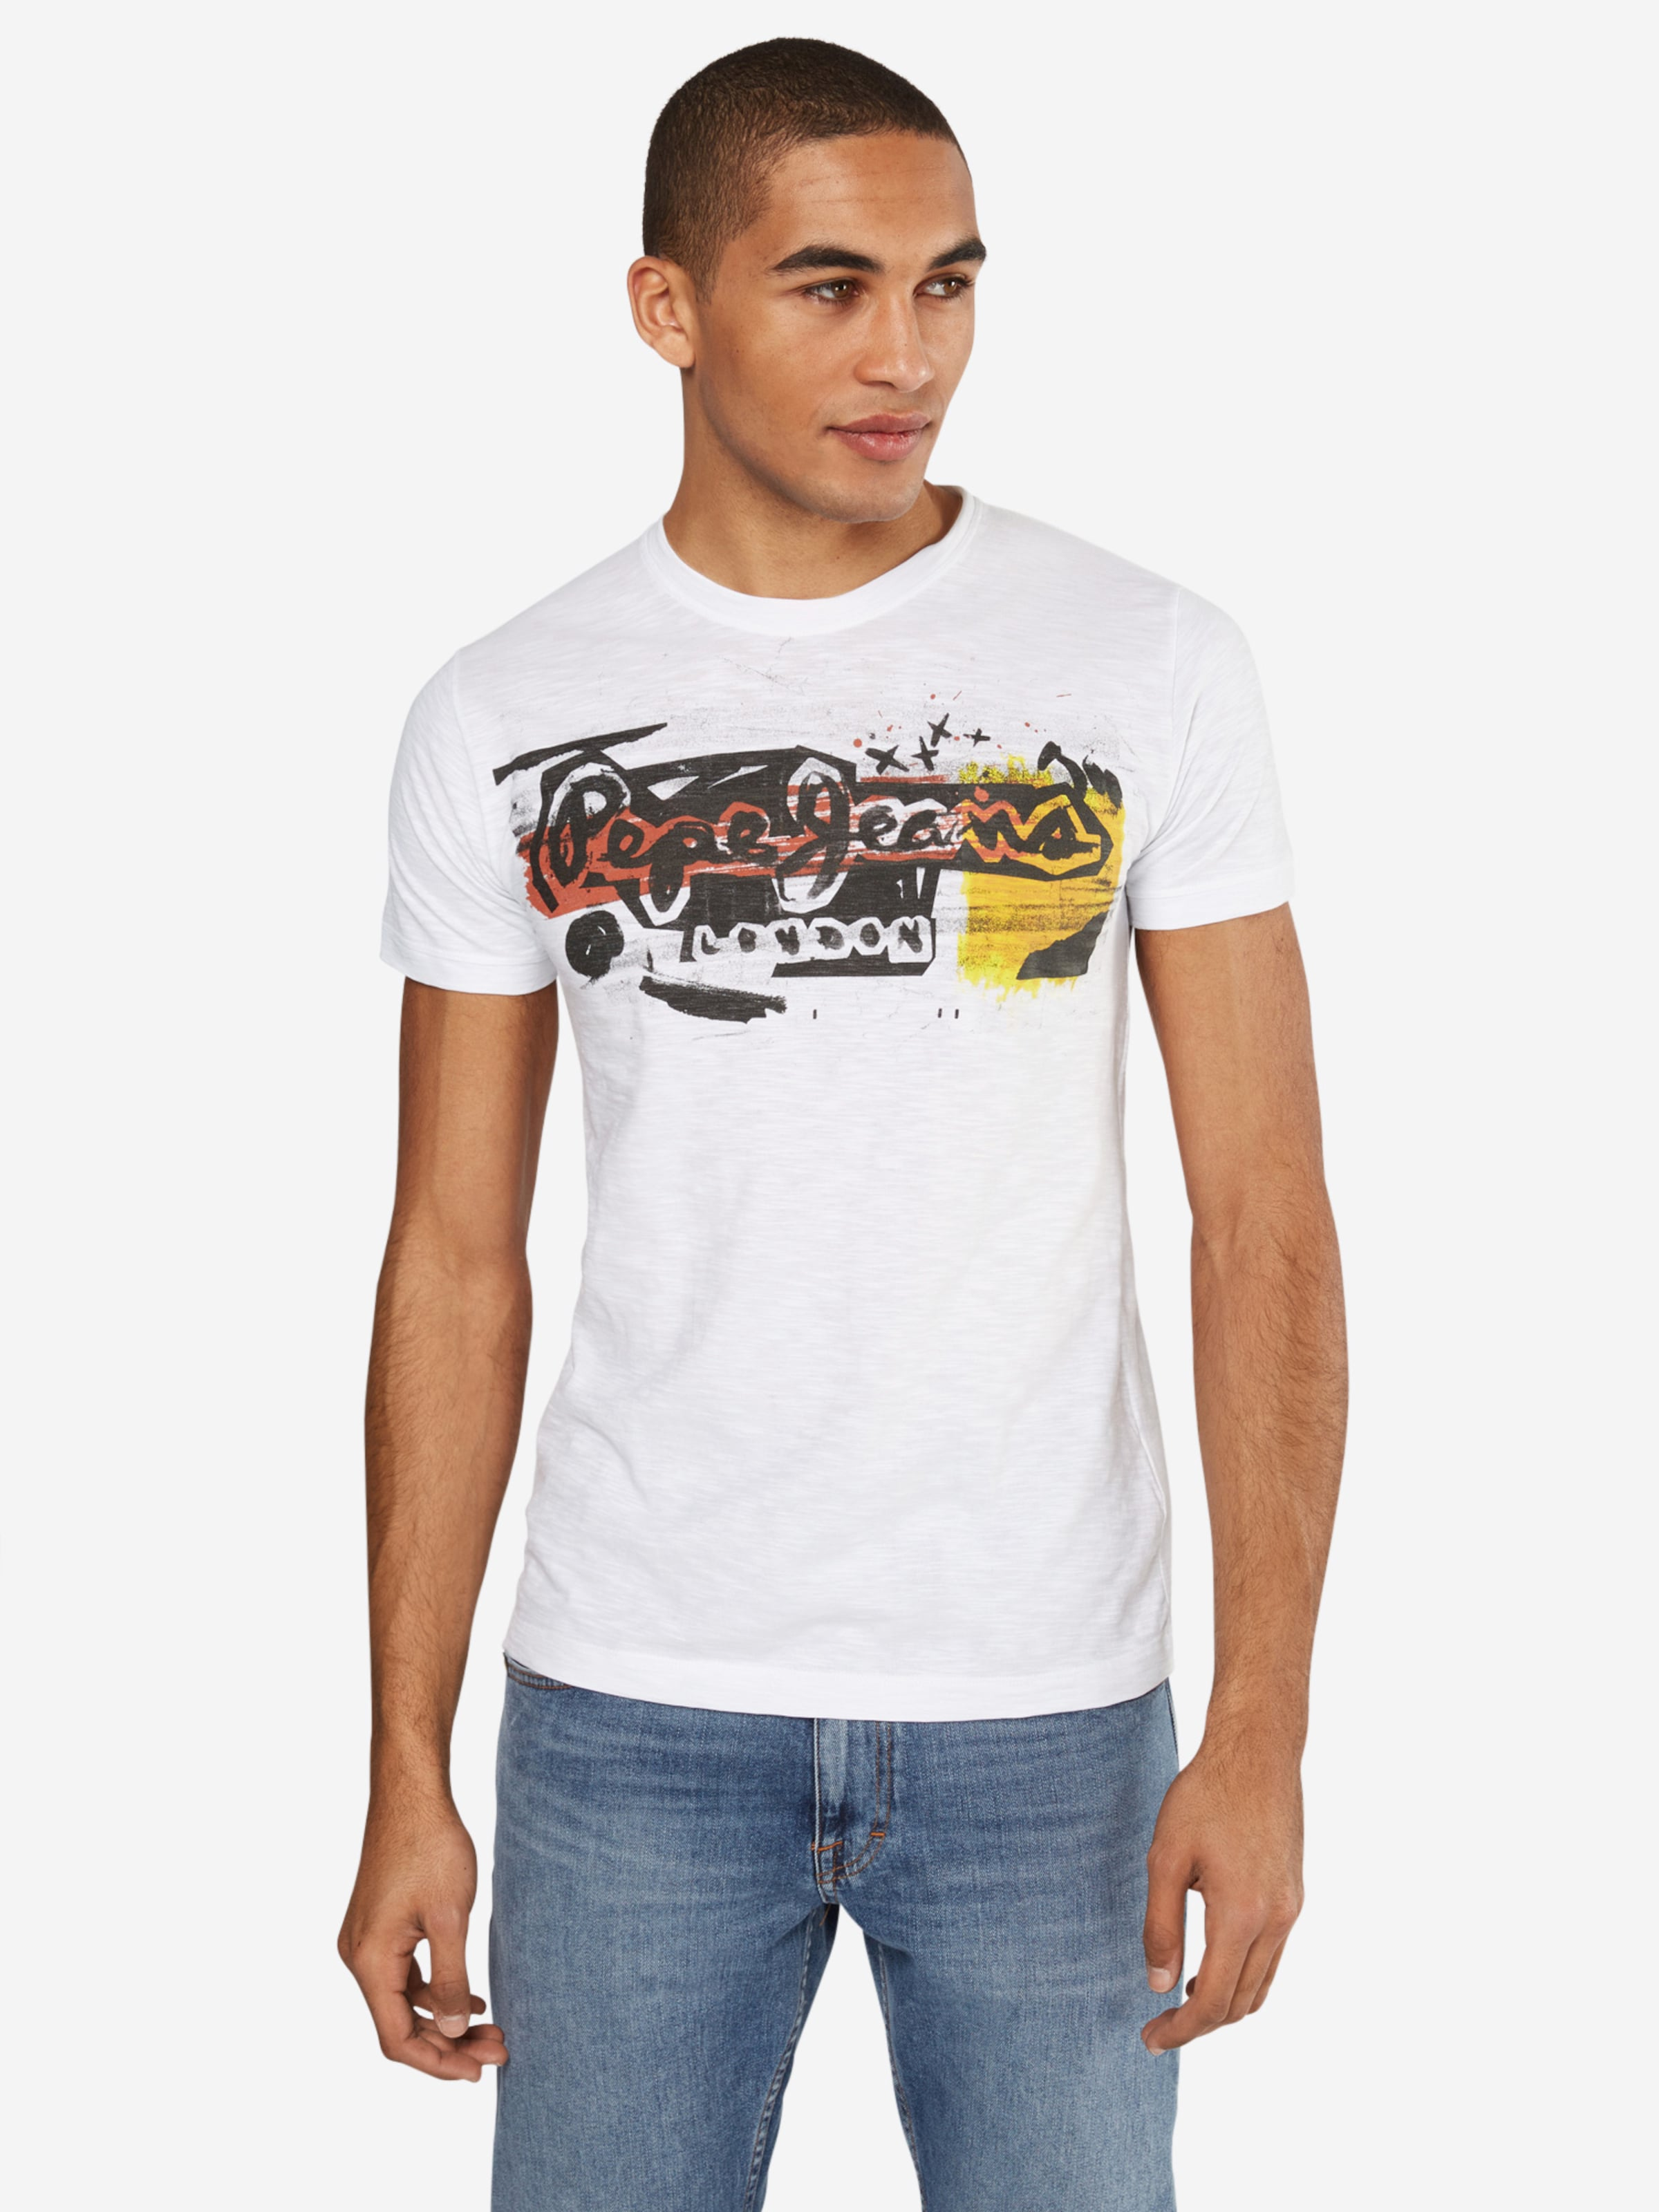 Pepe 'amersham' En Blanc shirt JauneNoir Jeans T VzqpSMU